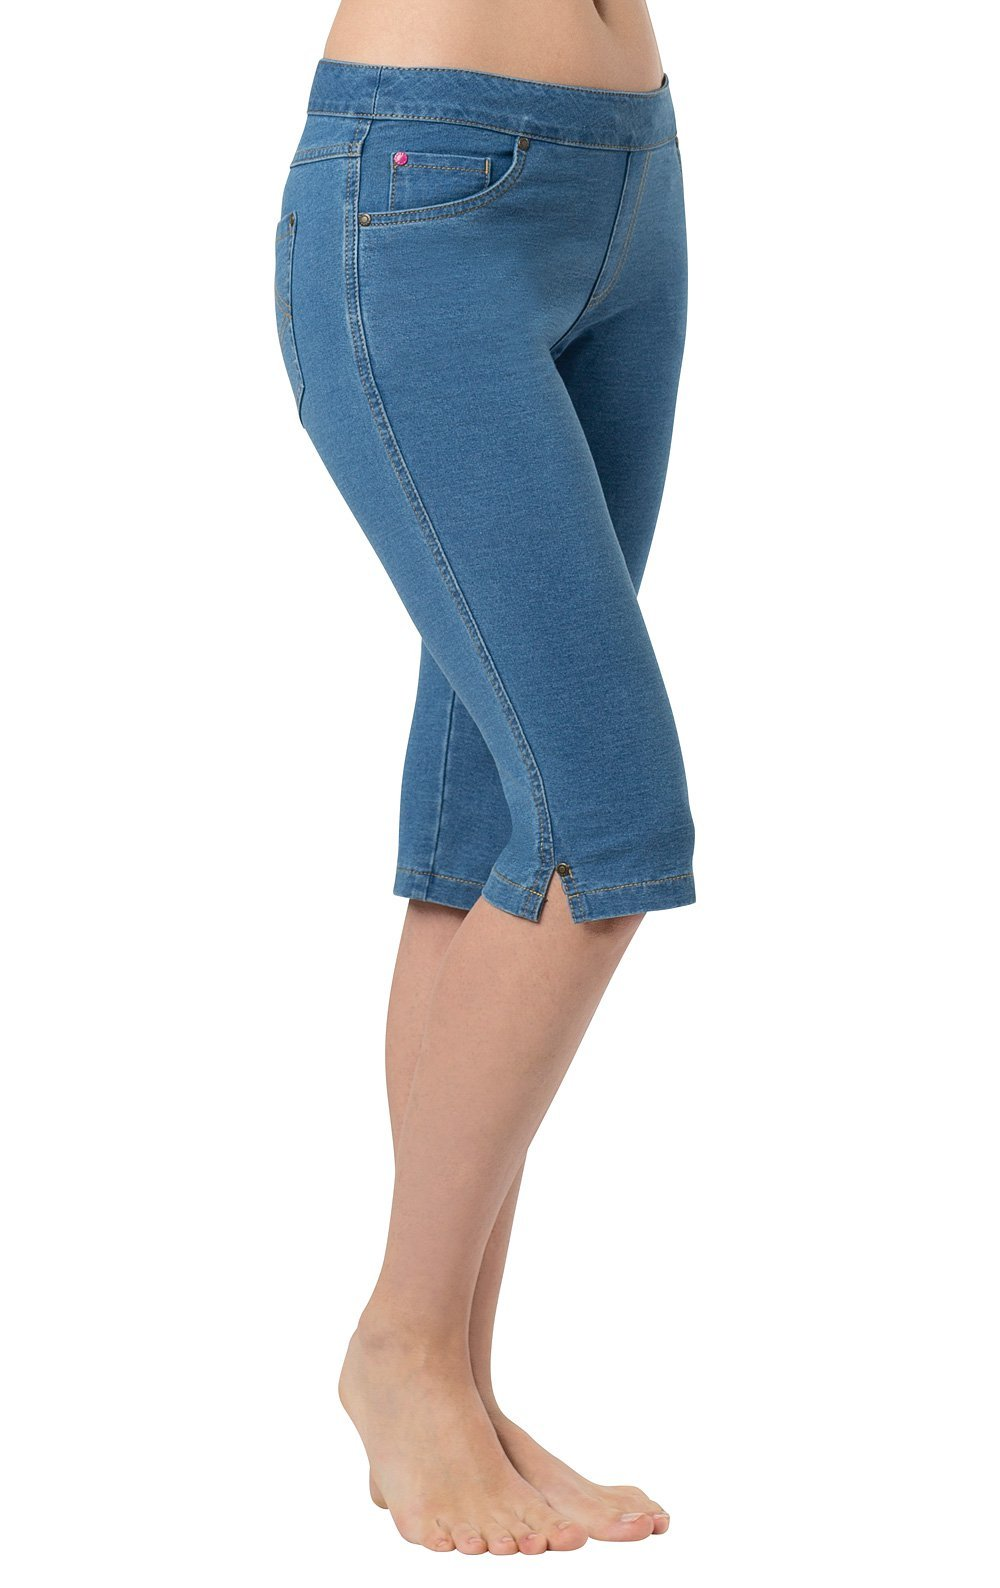 PajamaJeans Women's Soft Knee-Length Stretch Denim Shorts, Bermuda, Medium 8-10